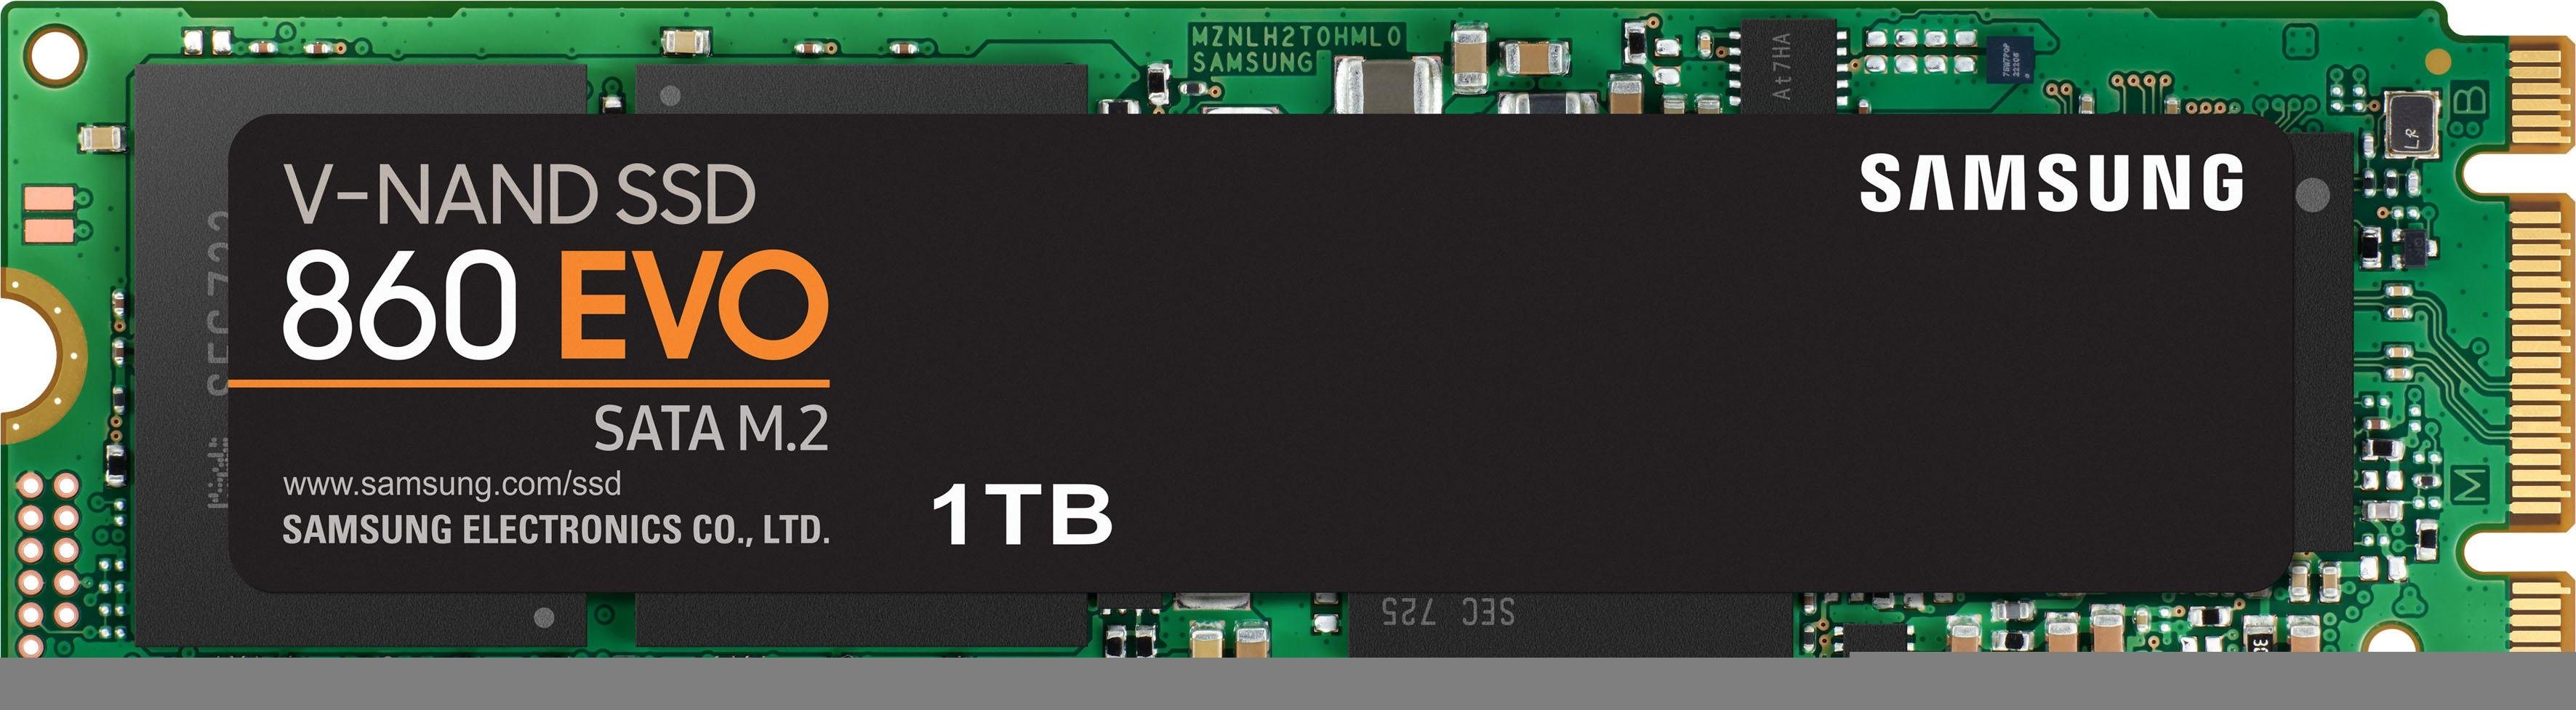 »860 EVO M.2 SATA III SSD« SSD-Festplatte 2,5